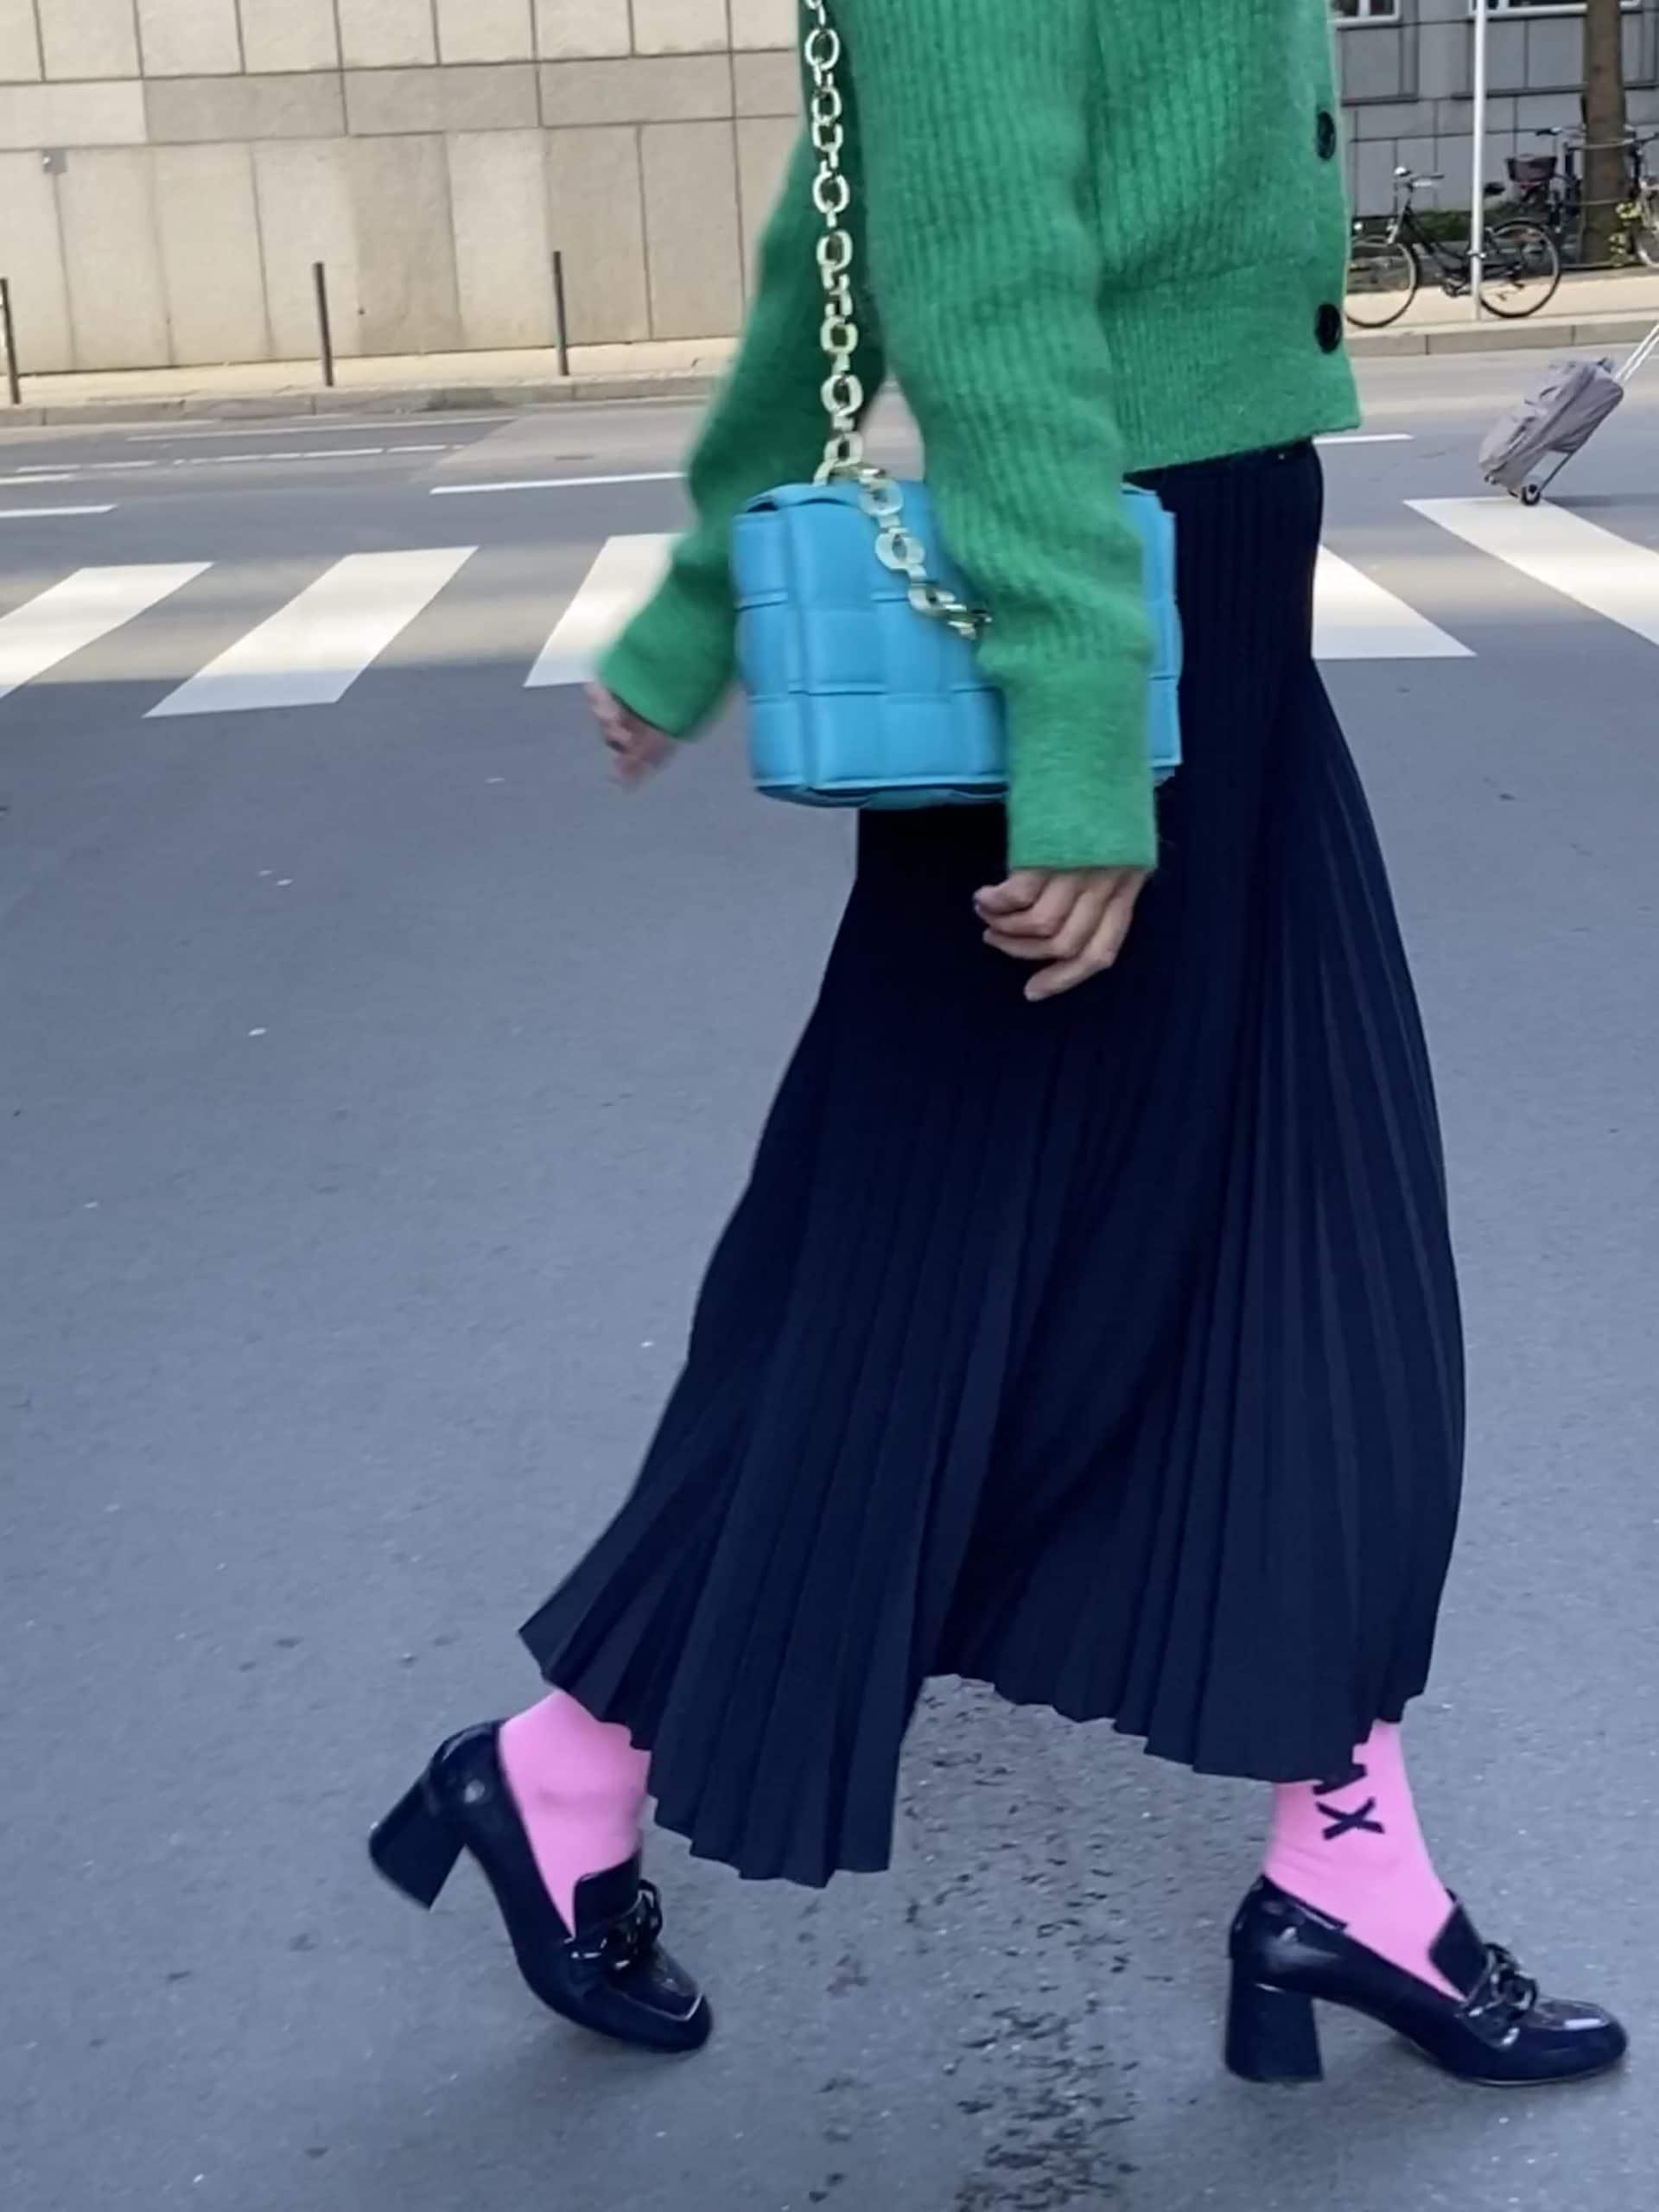 strickjacke-plissee-rock-loafers-socken-mode-blog-ue50-oceanblue-style.jpg